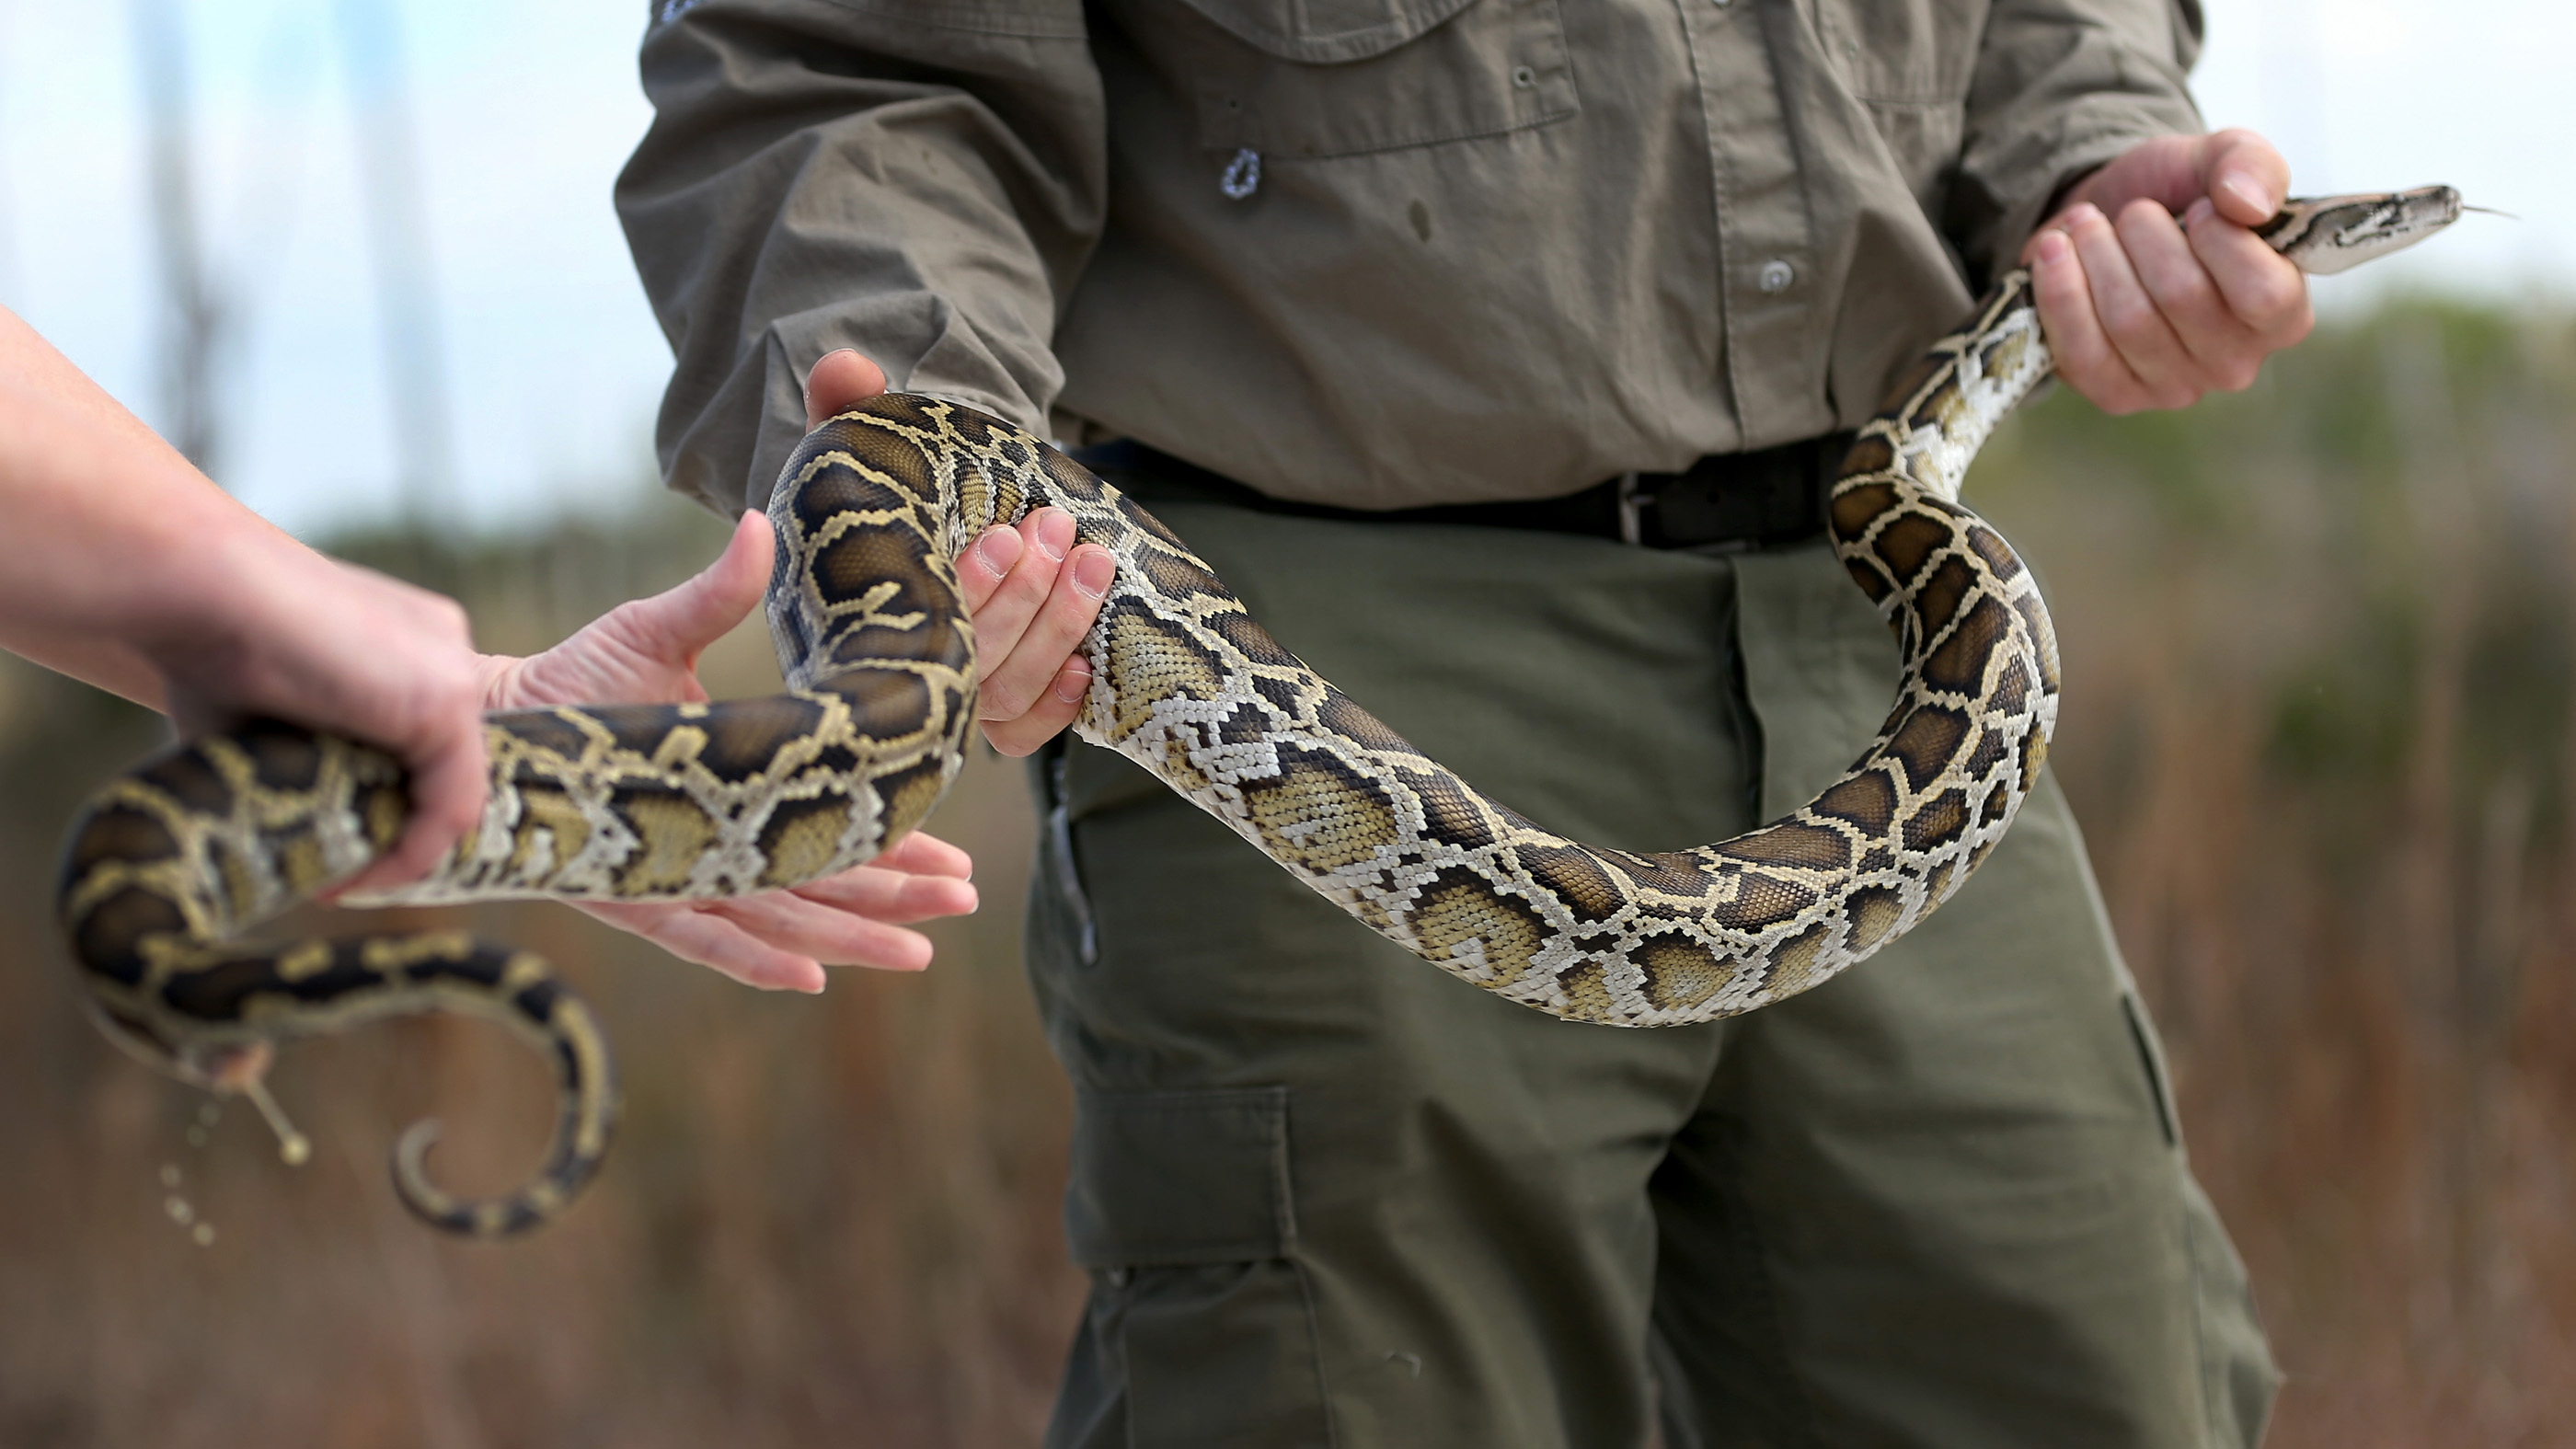 Would you eat a python to avoid wasting the Everglades? ddoJ9izj5AM7VJ8VPhTkE7